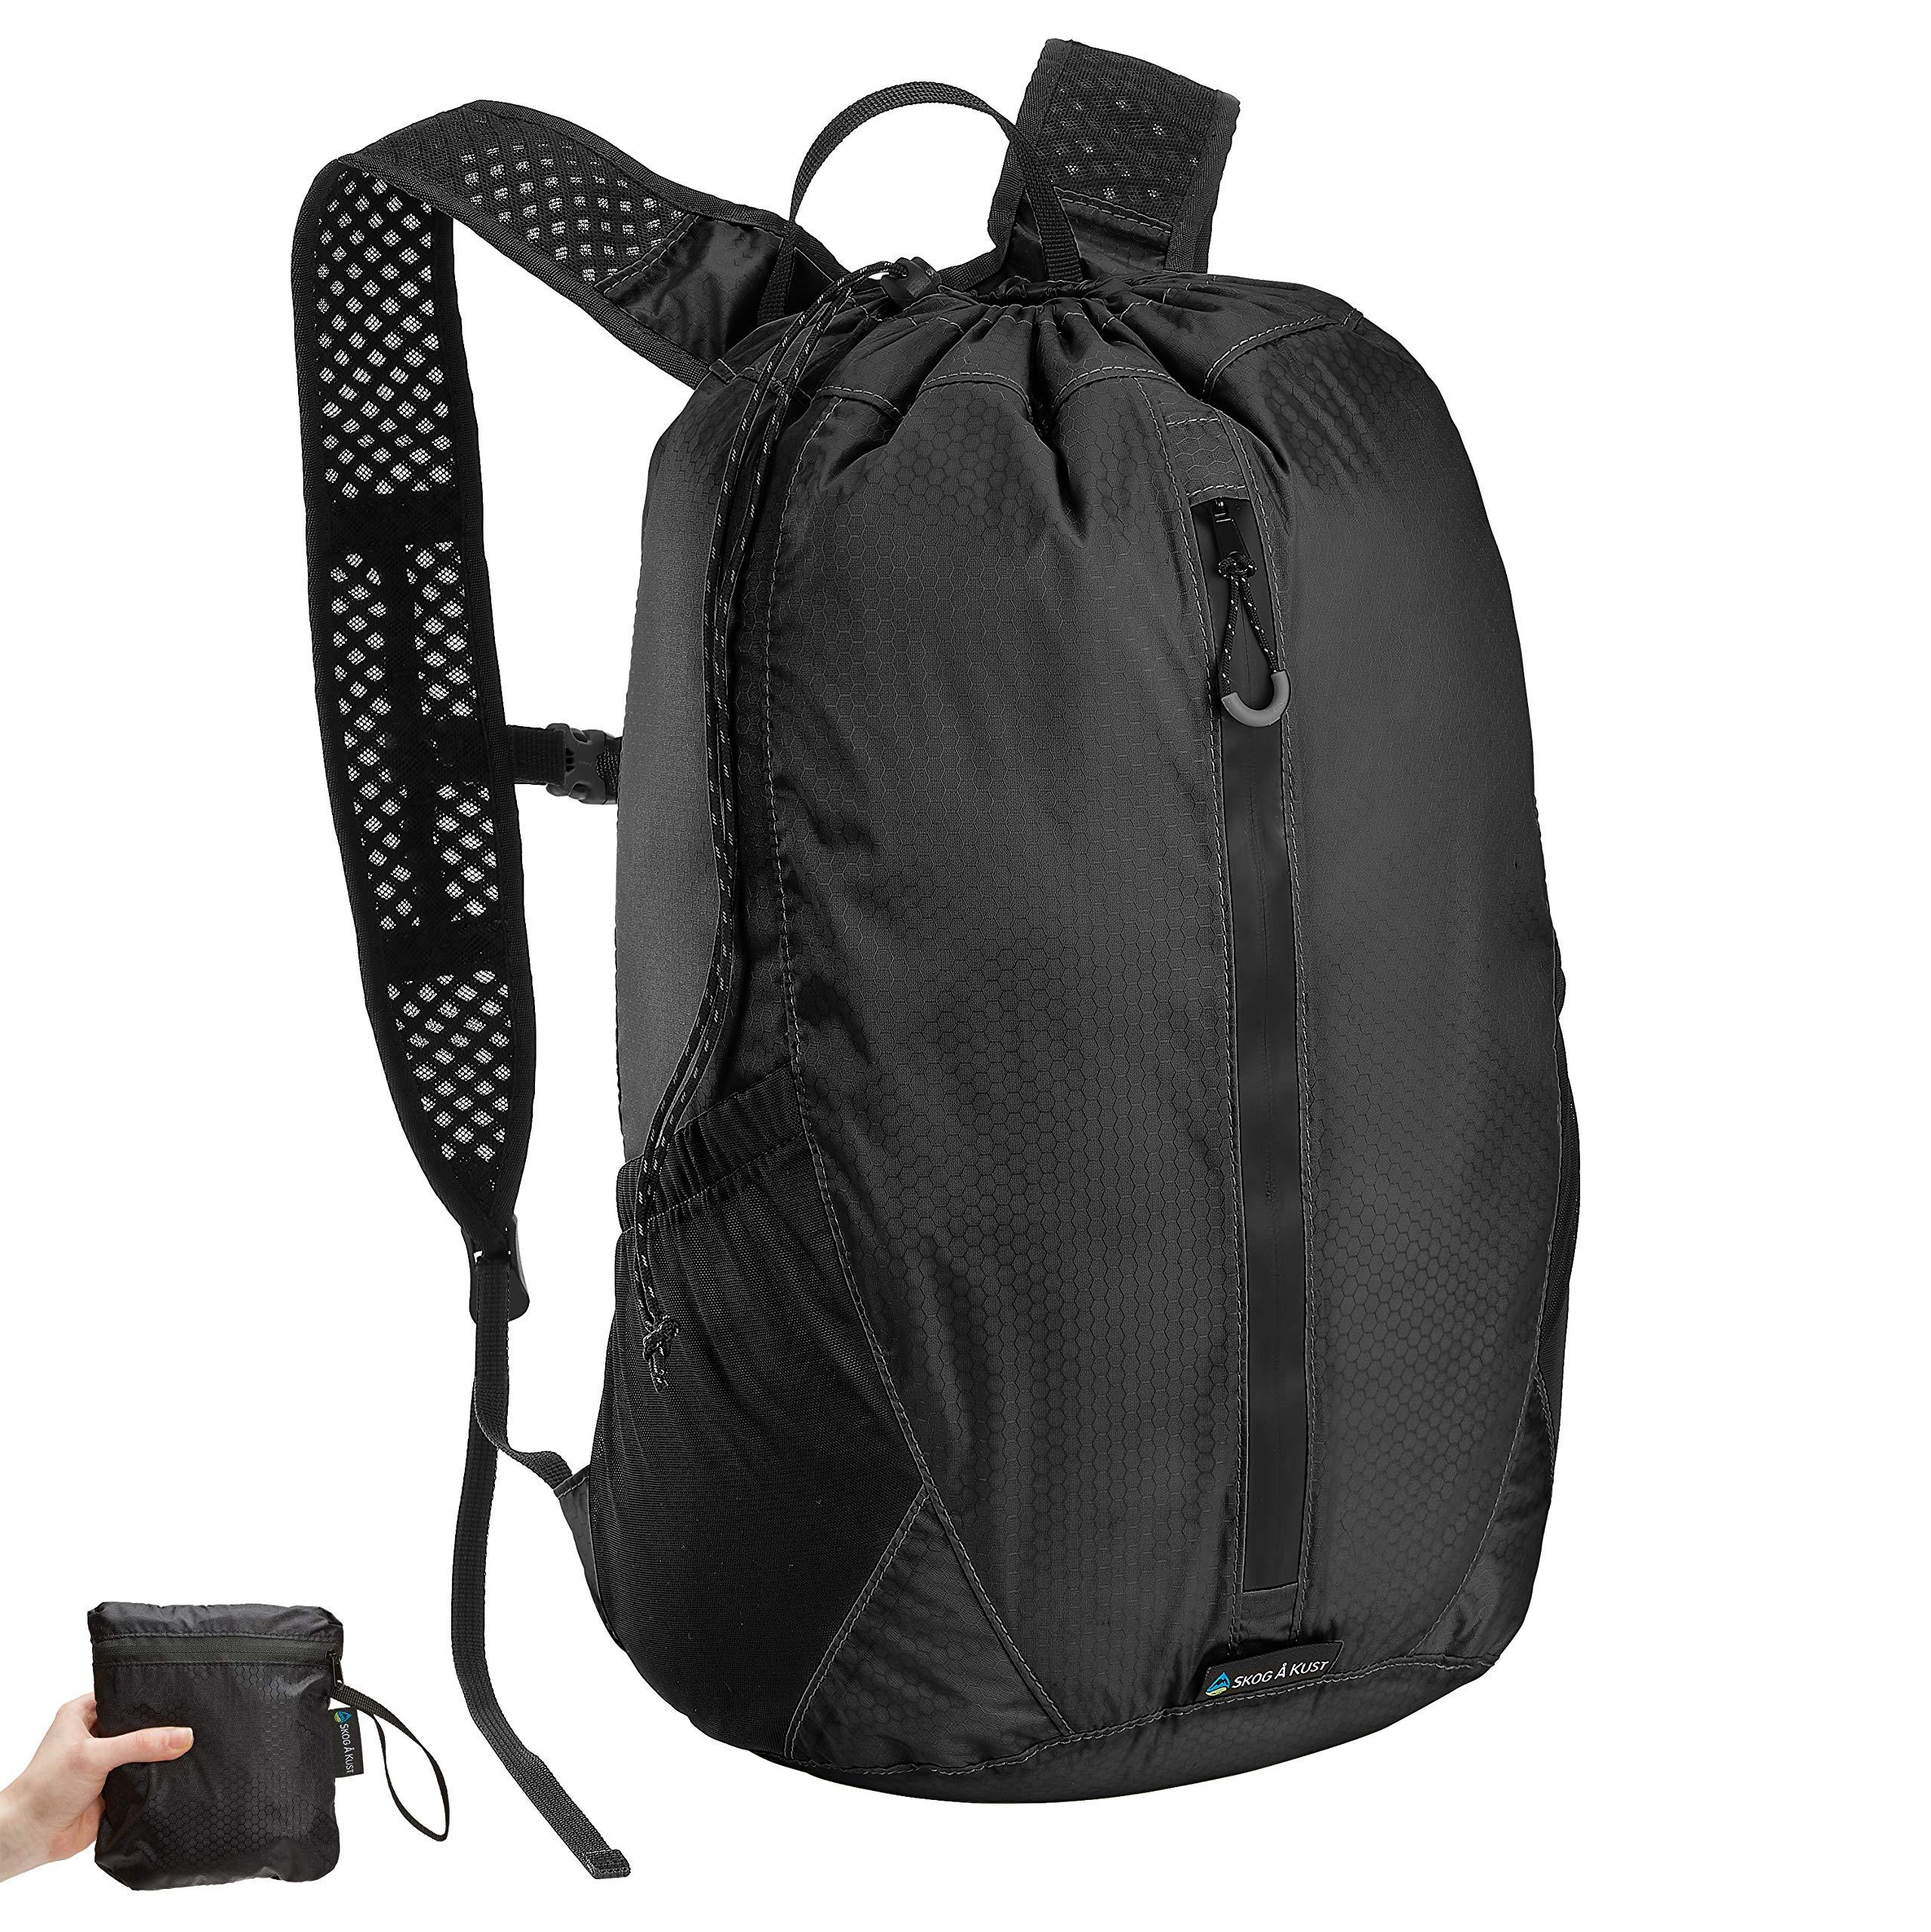 Såk Gear LiteSåk 2.0 Waterproof Ultralight Dry Bag | Black 2.0, 18 Liter Backpack